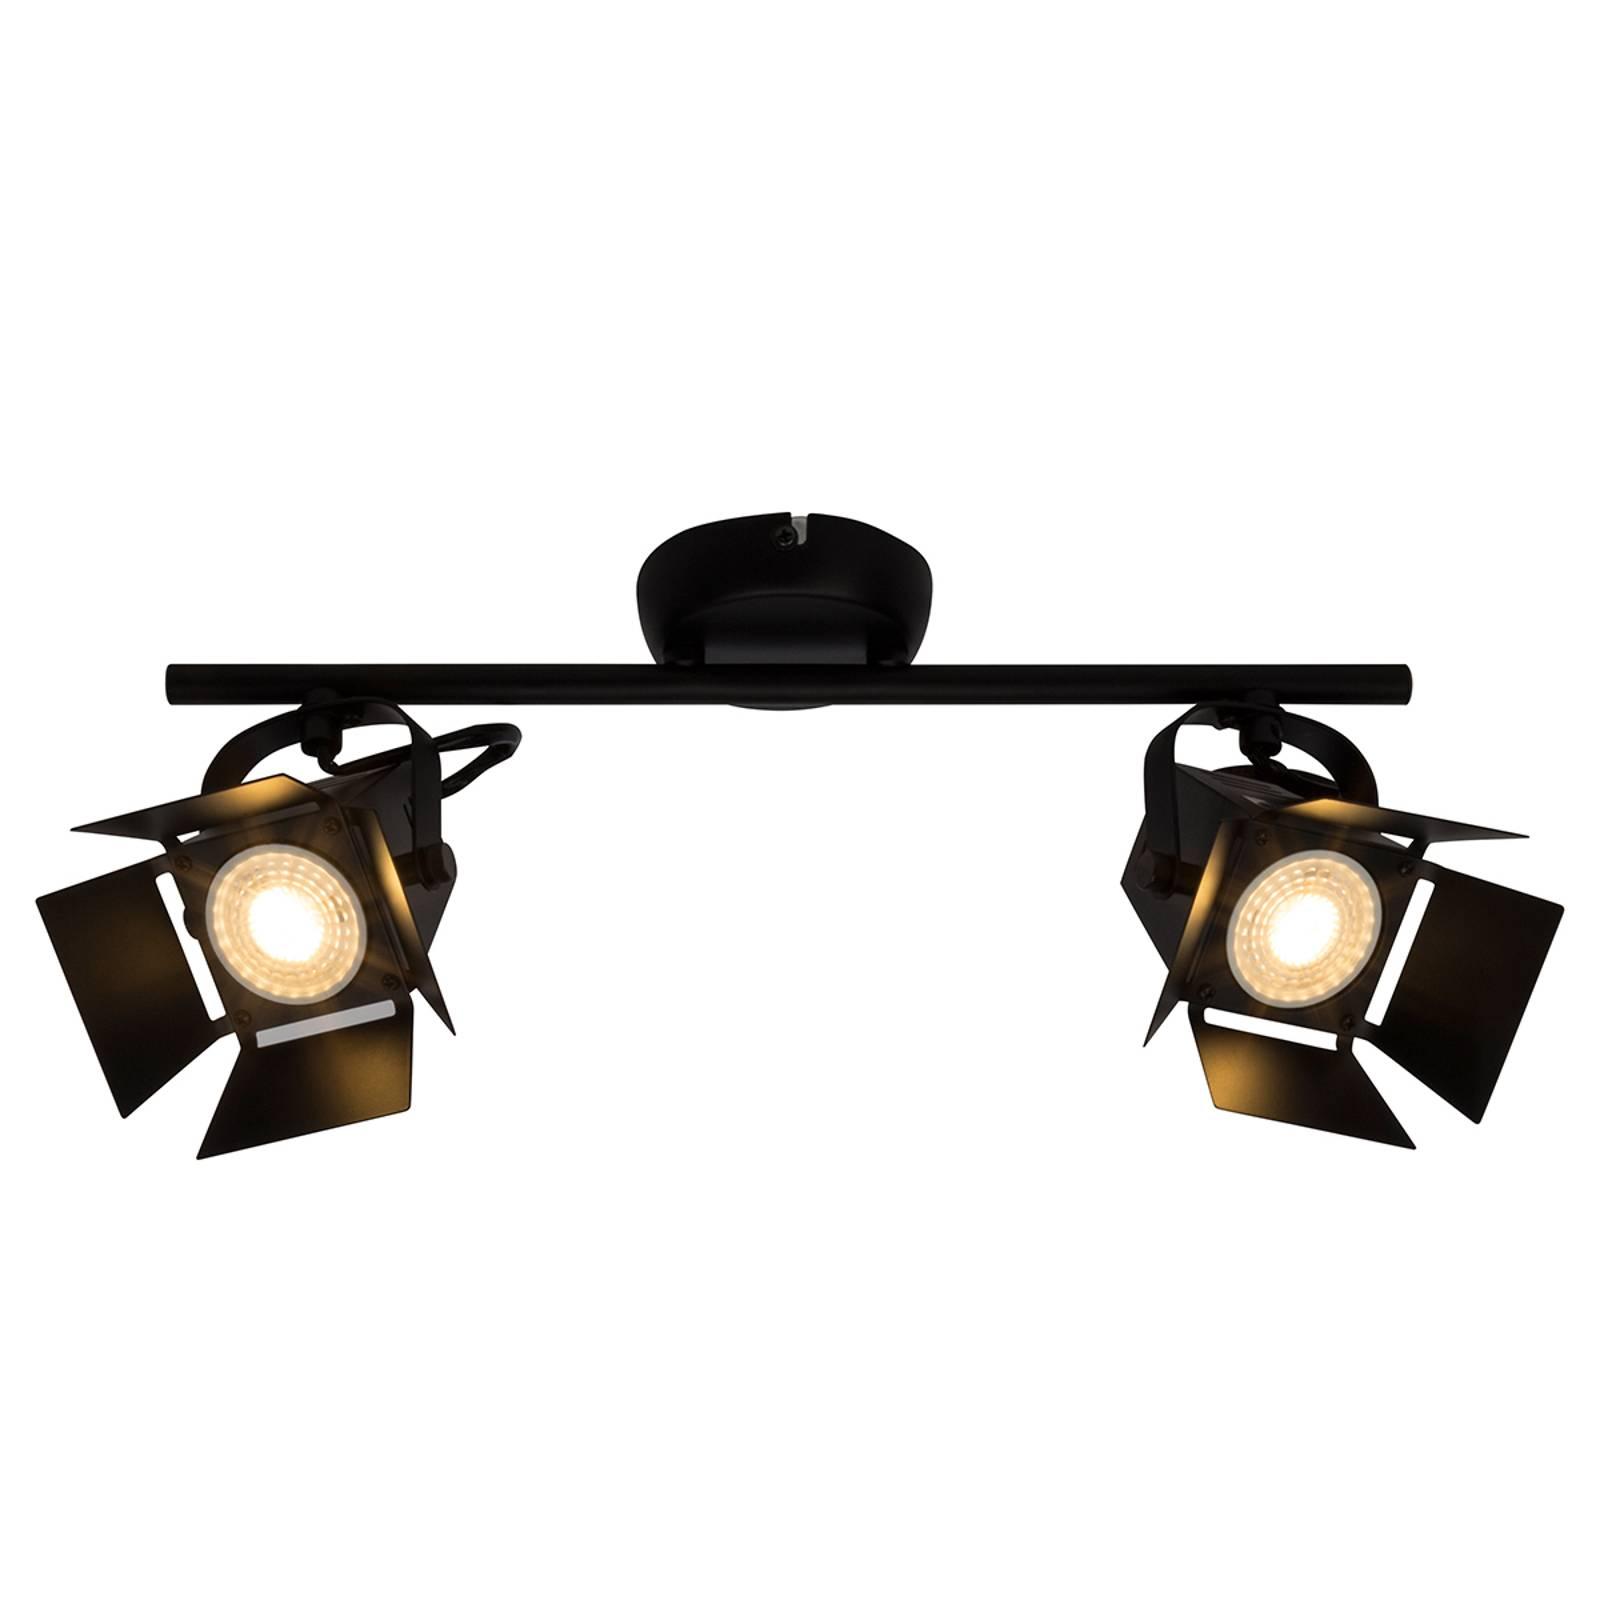 2-lamps LED spot plafondlamp Movie, zwart